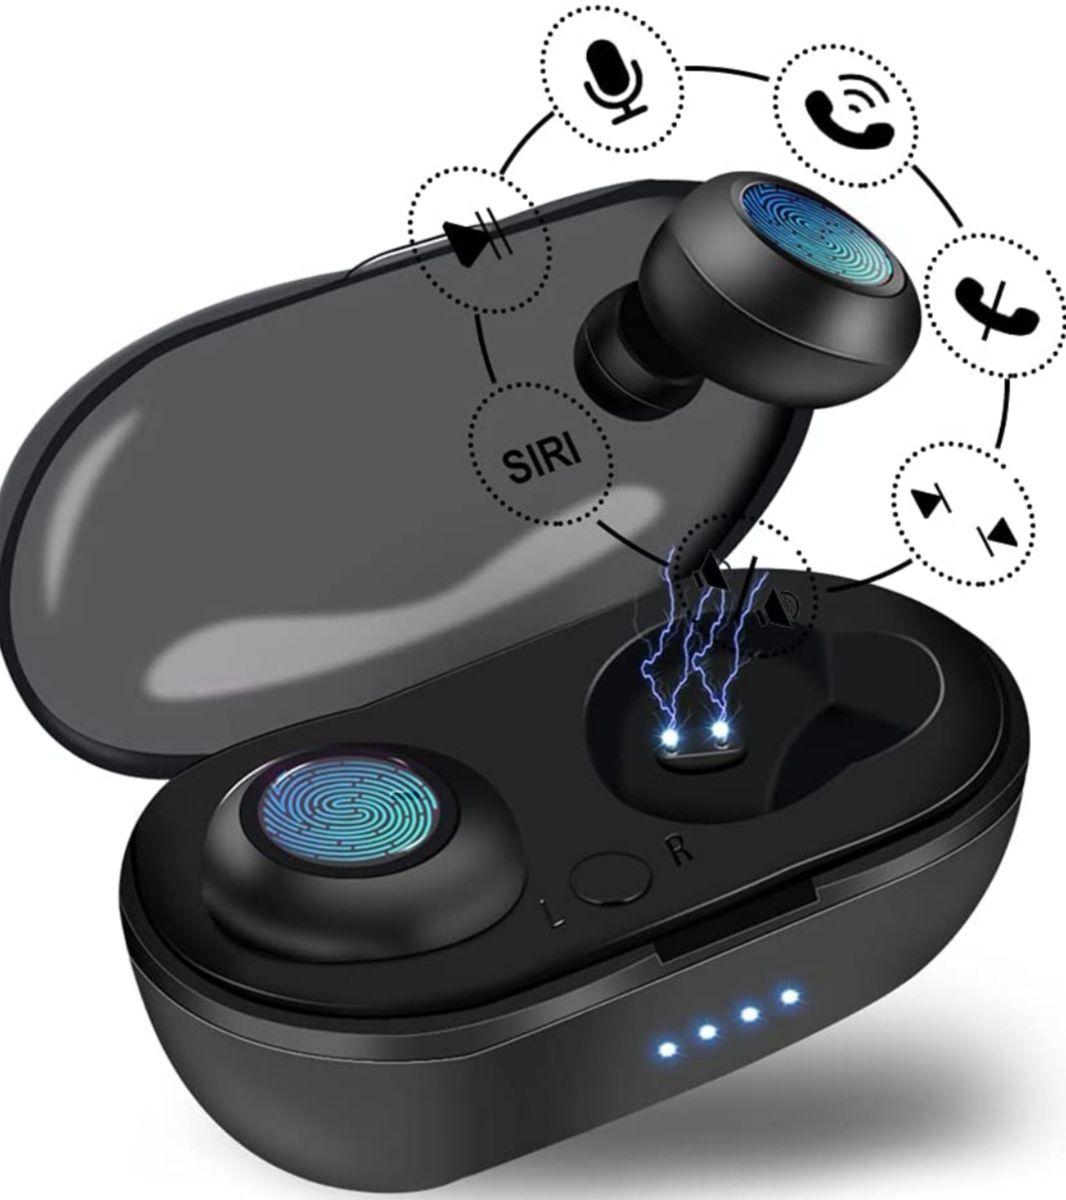 Auriculares Inalámbricos Bluetooth con micrófono Dual y caja de carga, IPX5